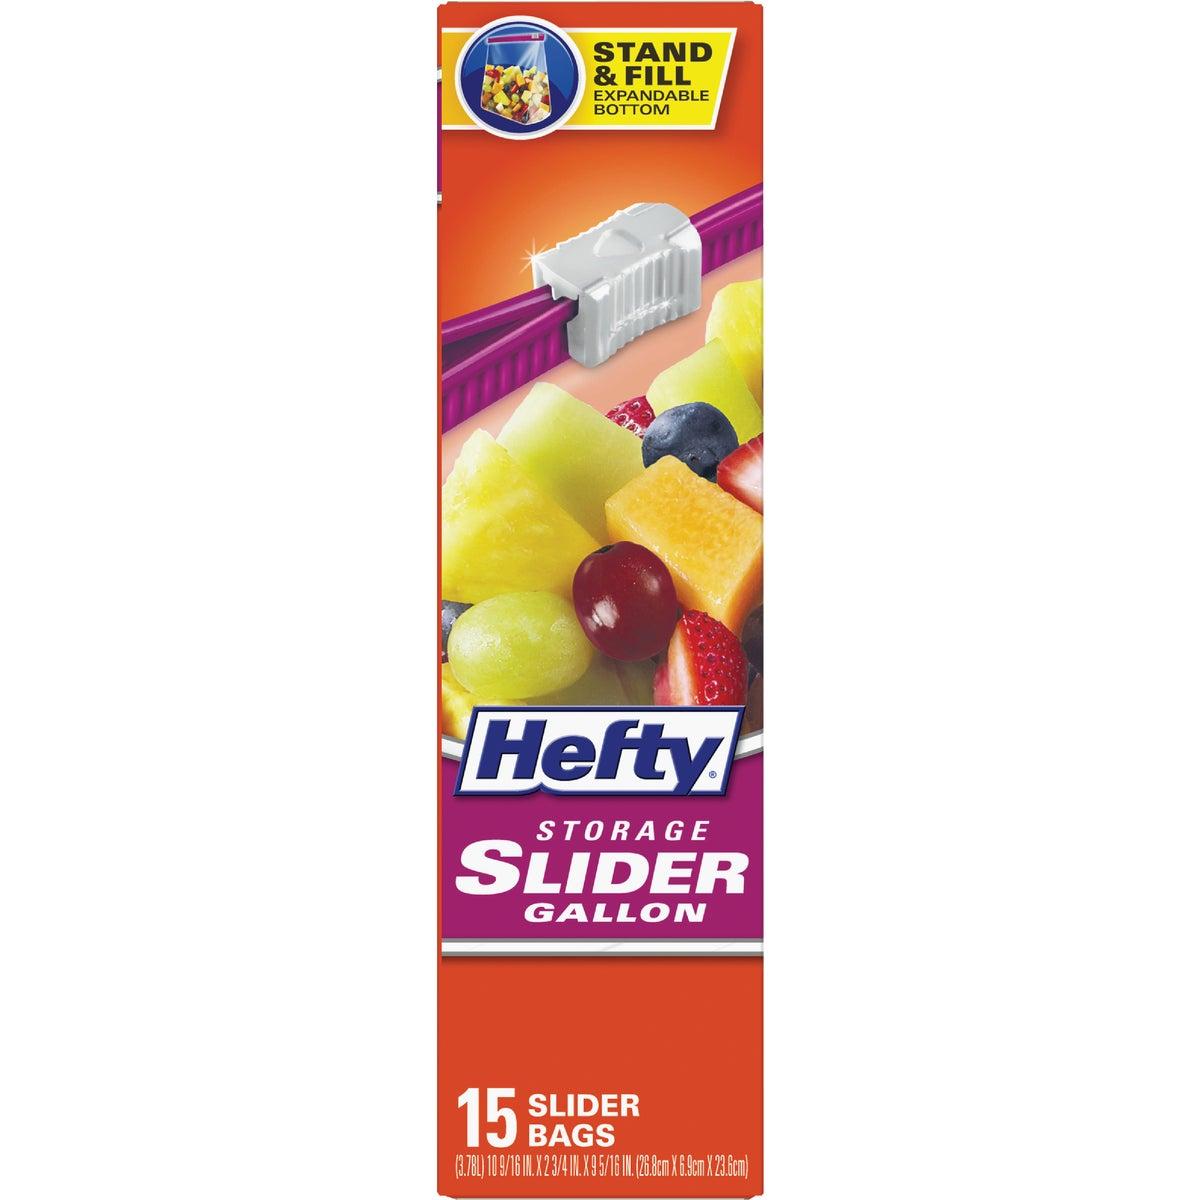 GAL HEFTY FOOD STRG BAG - R8-1417 by Reynolds Pactiv